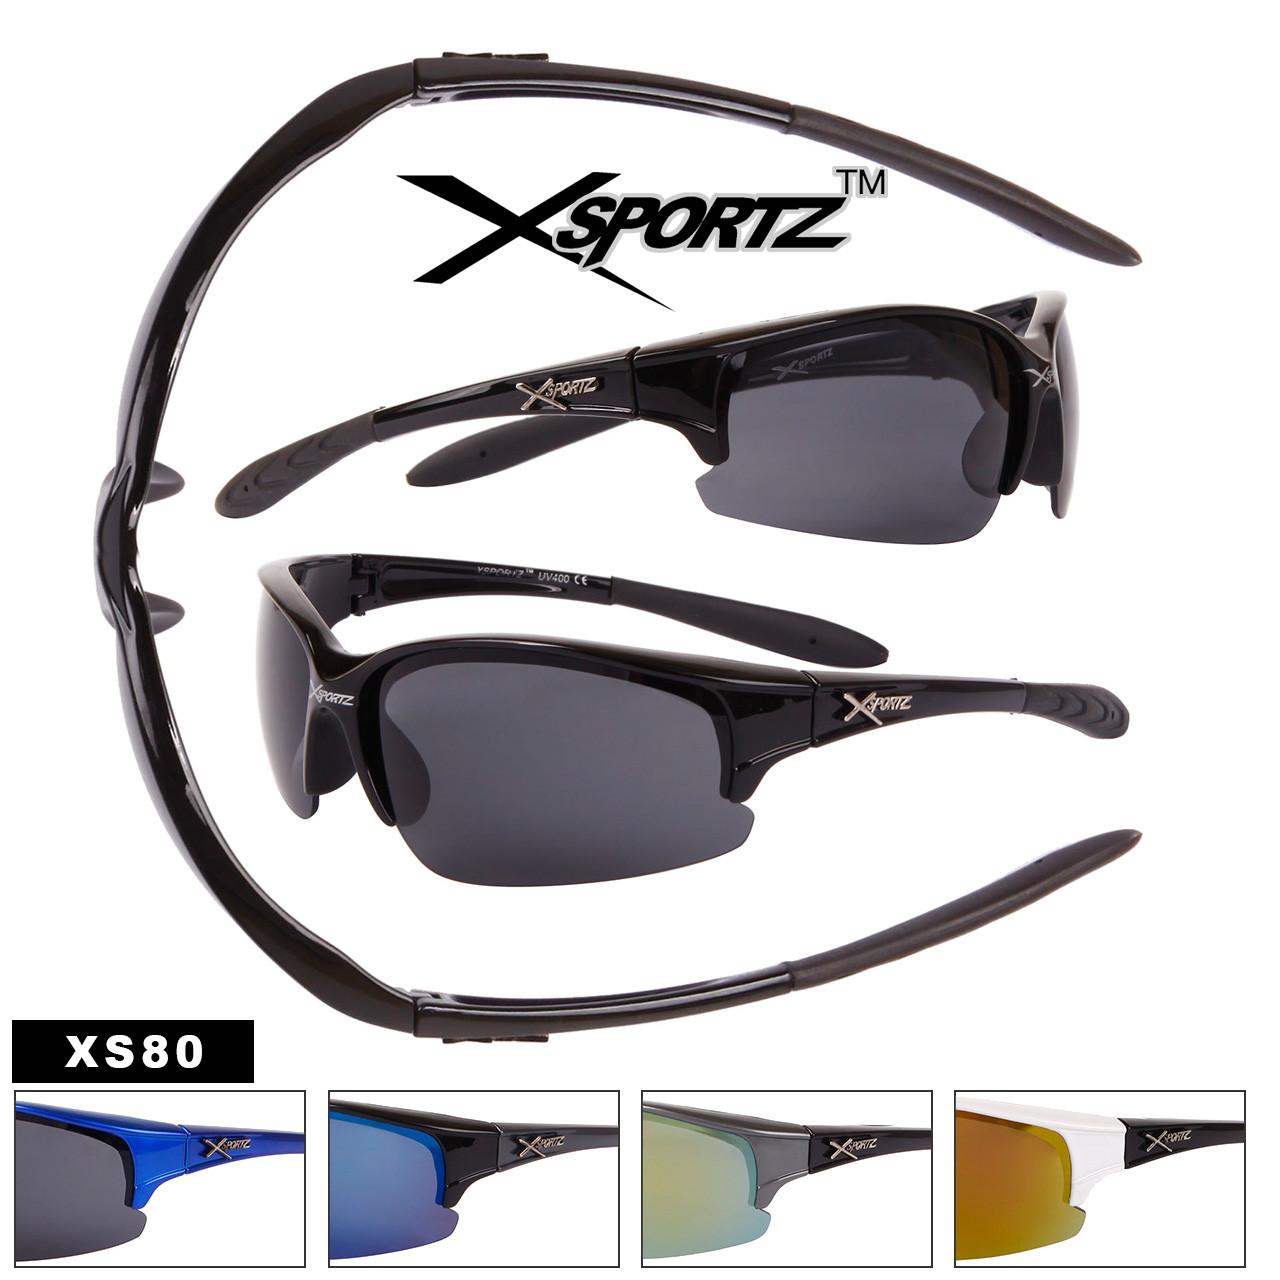 Xsportz Sports Sunglasses Wholesale - Style #XS80 (Assorted Colors) (12 pcs.)